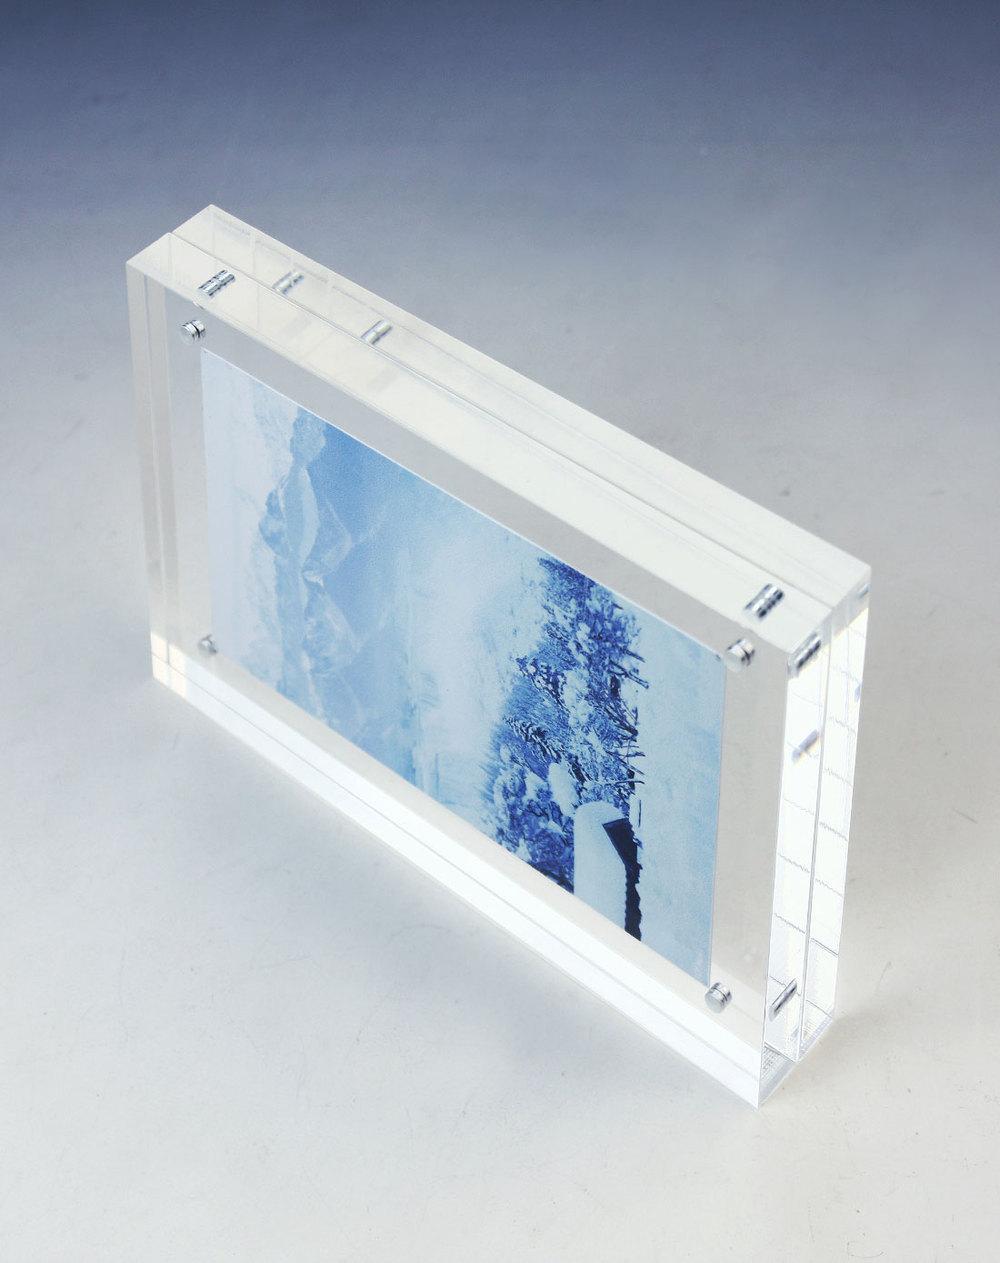 high quality acrylic photofunia photo frameacrylic magnetic photo frame wholesale.jpg